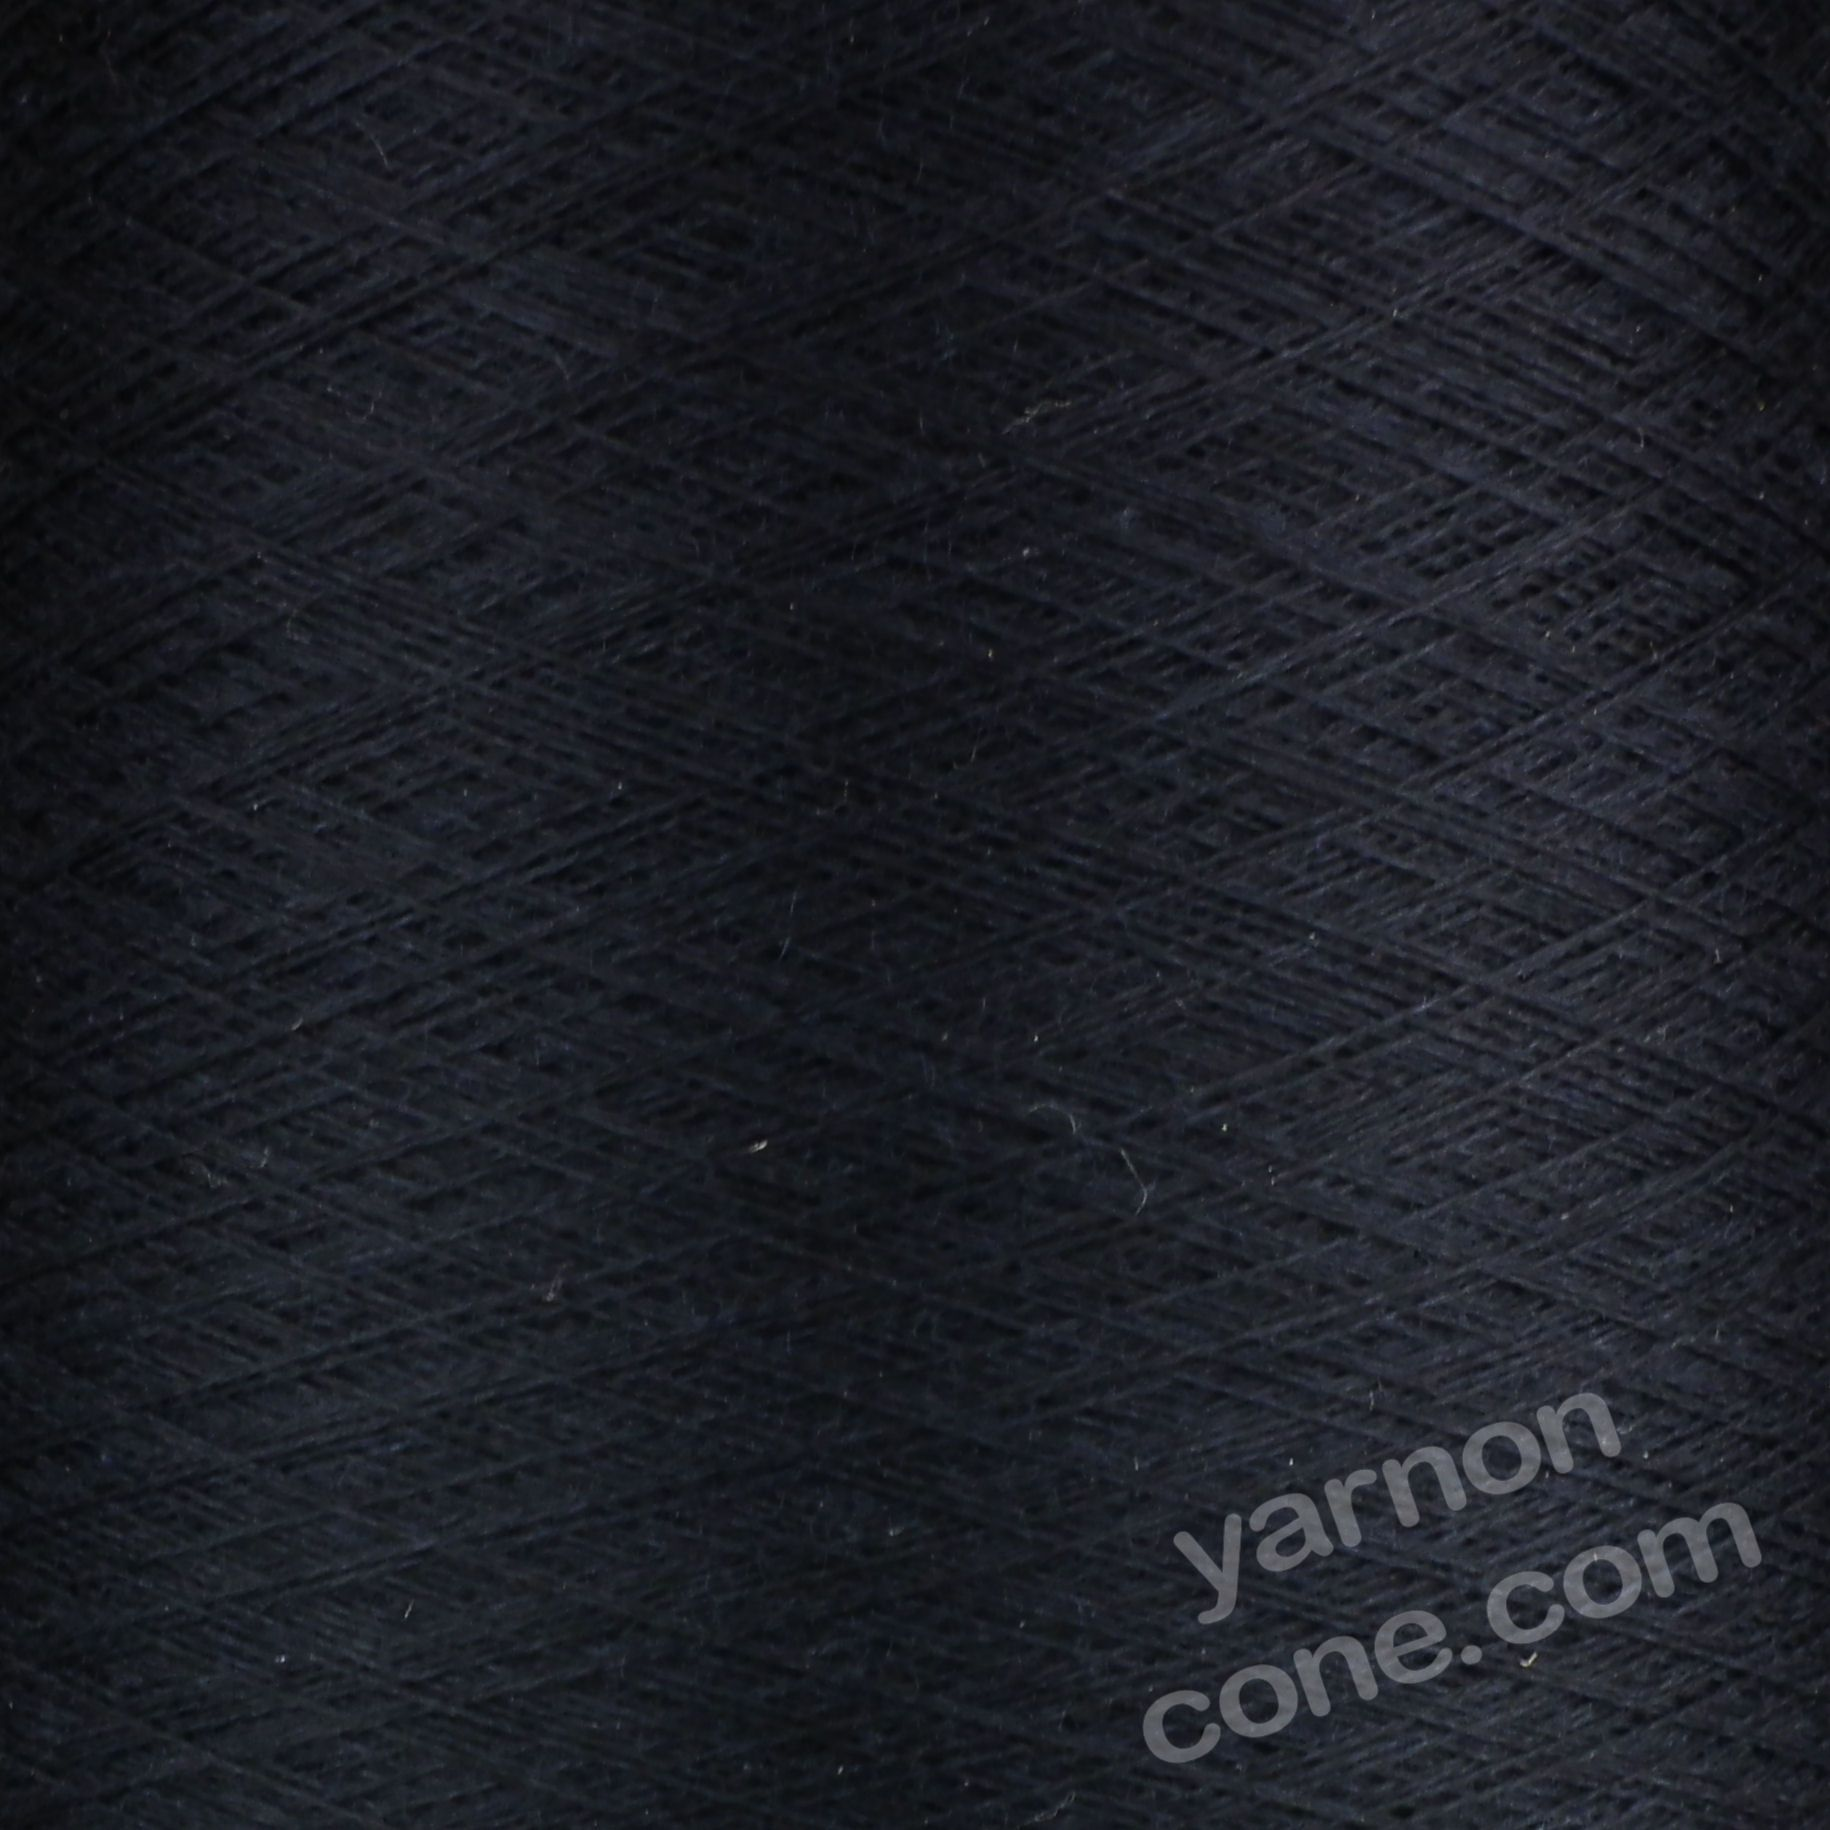 merino silk fine cobweb yarn on cone 2/60 NM UK knitting machine savile navy blue